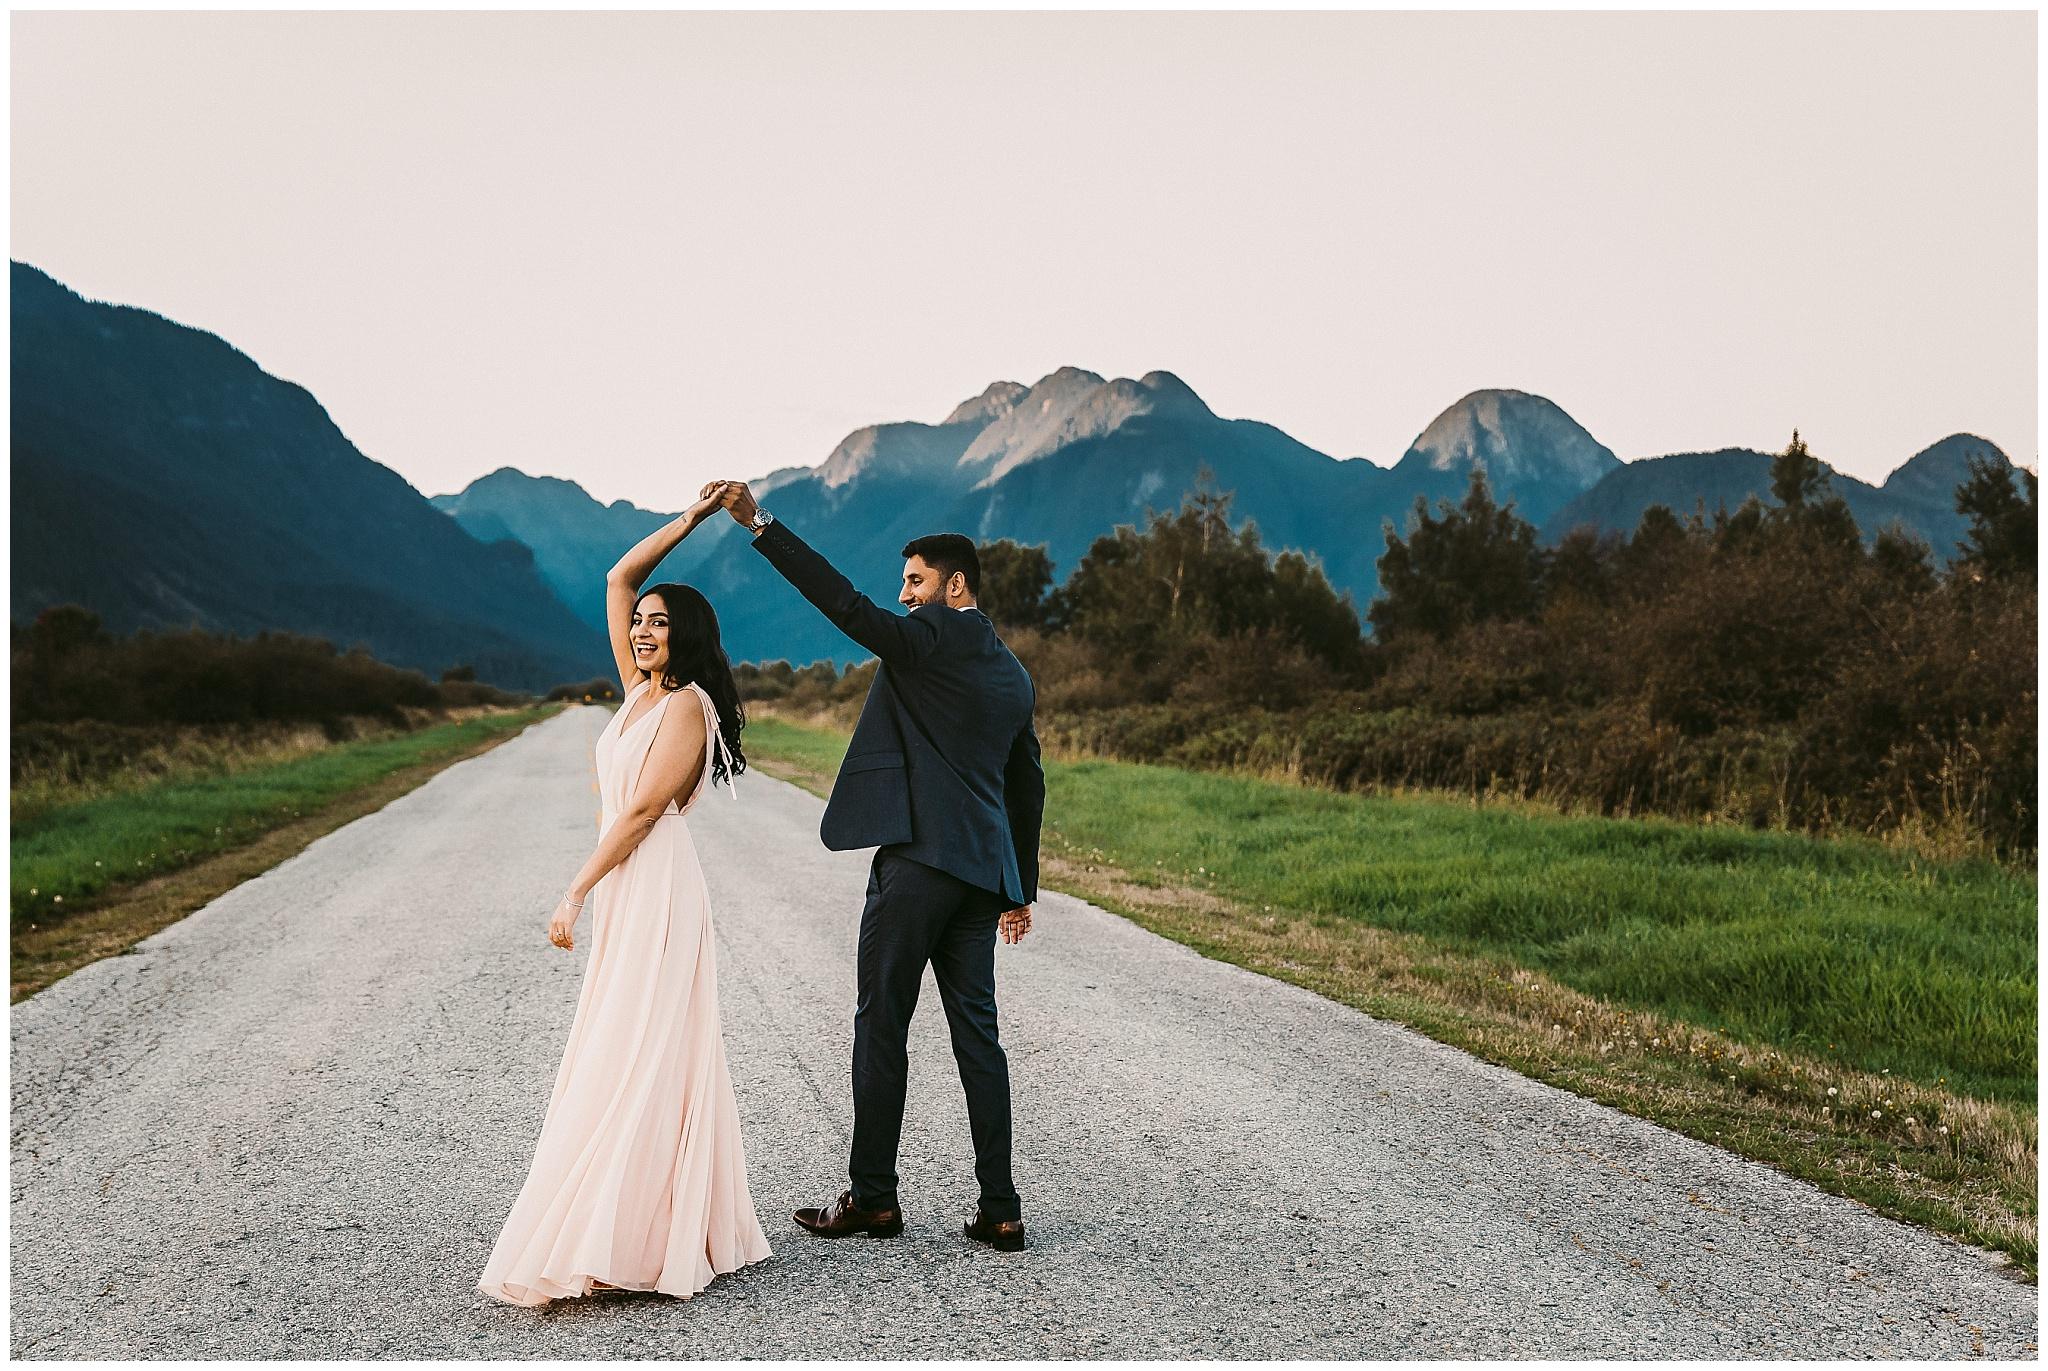 Pitt Lake-Engagement-Photographer-6.jpg